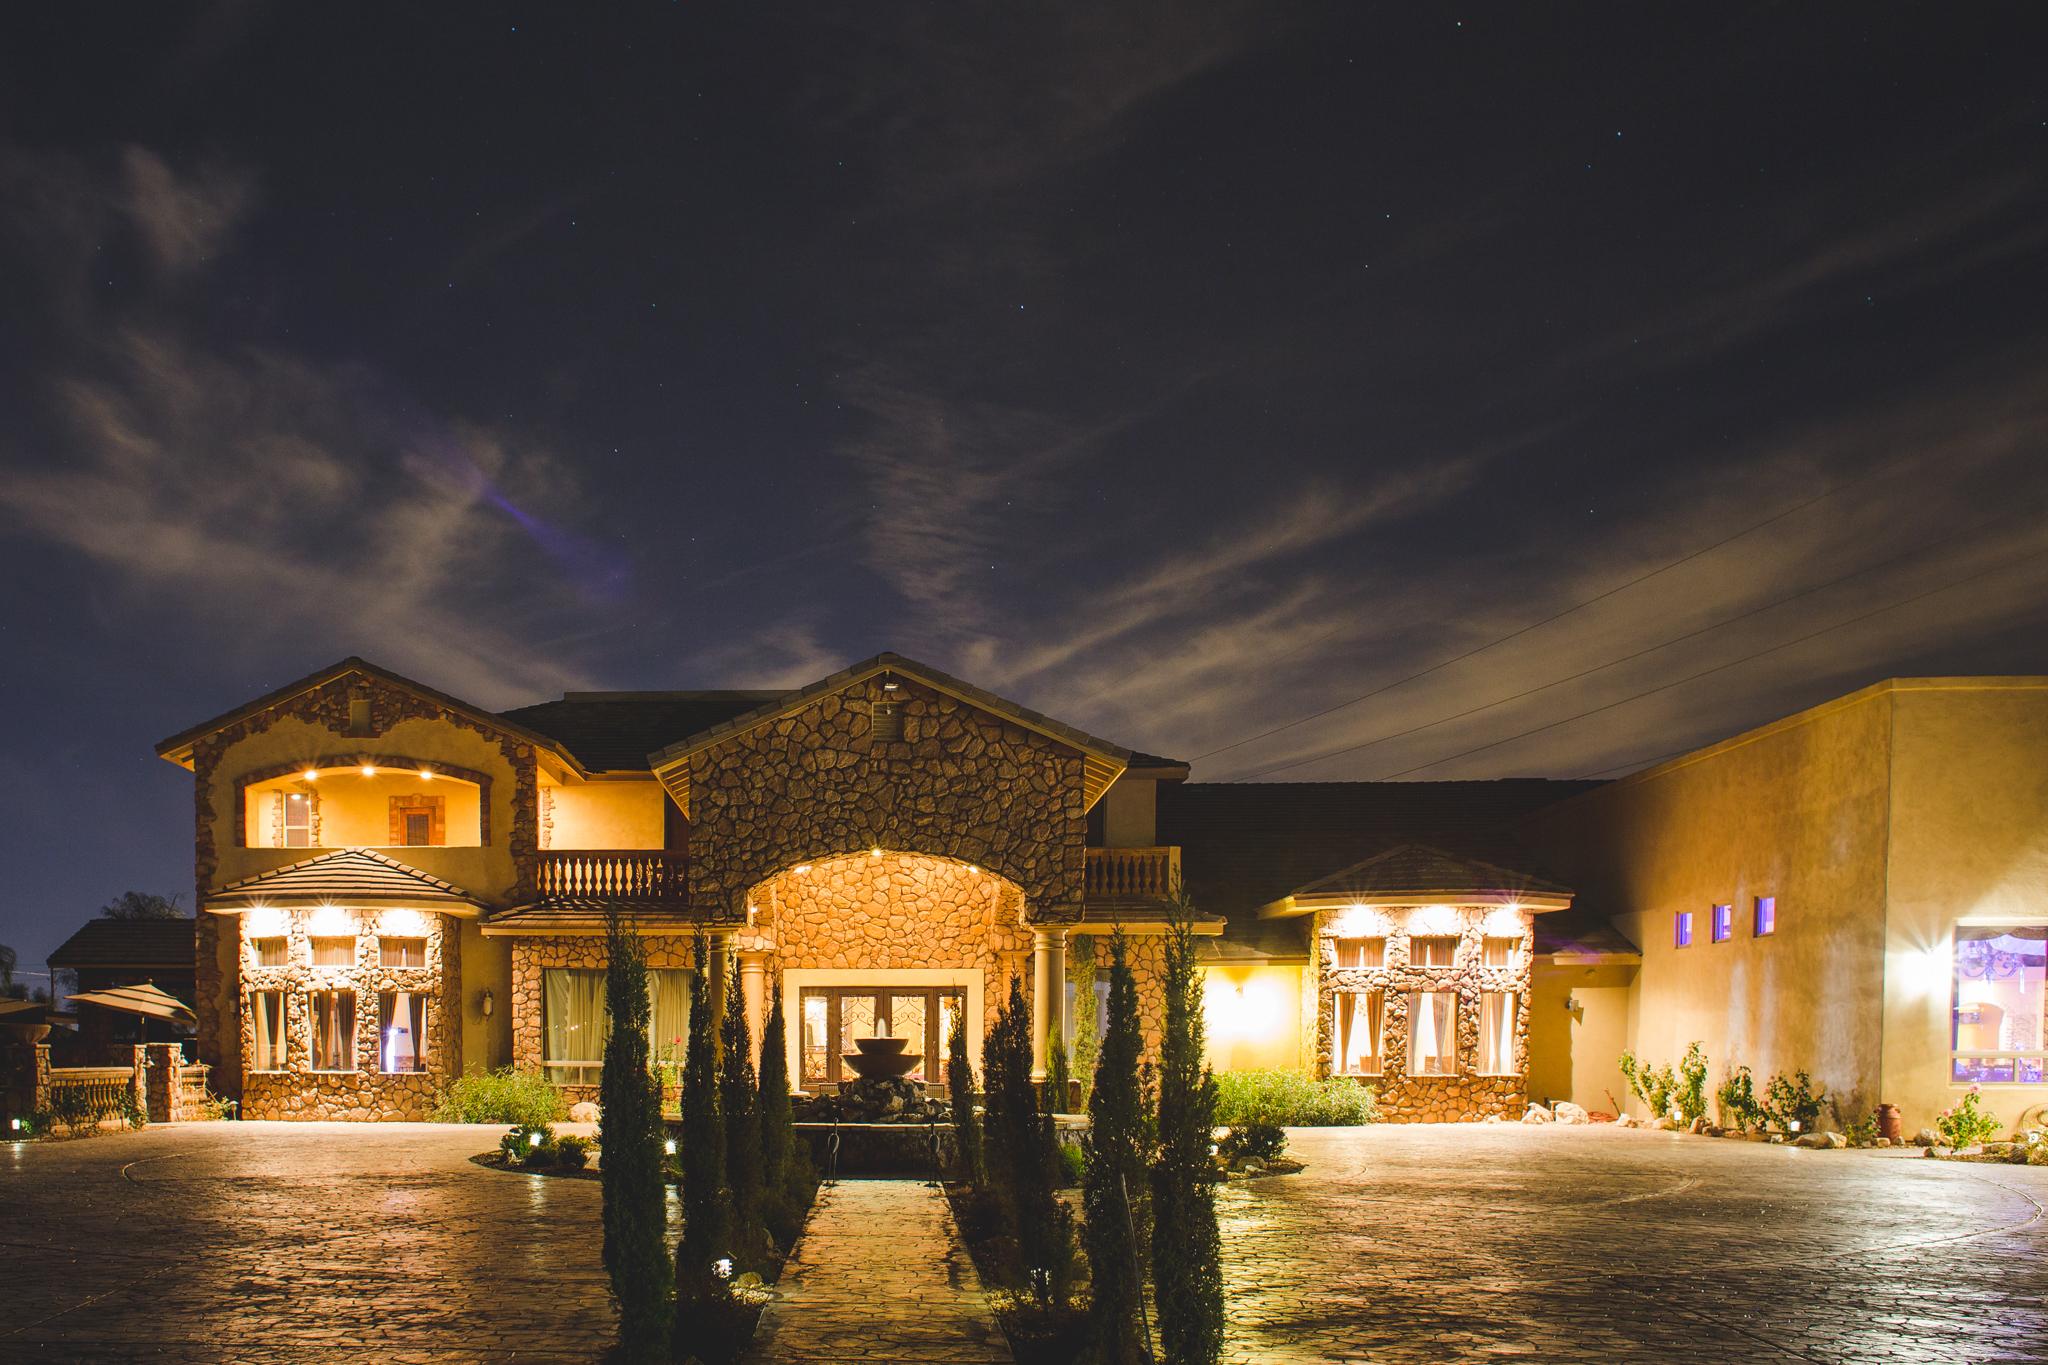 aaron kjes photography superstition manor at night wedding venue stars mj